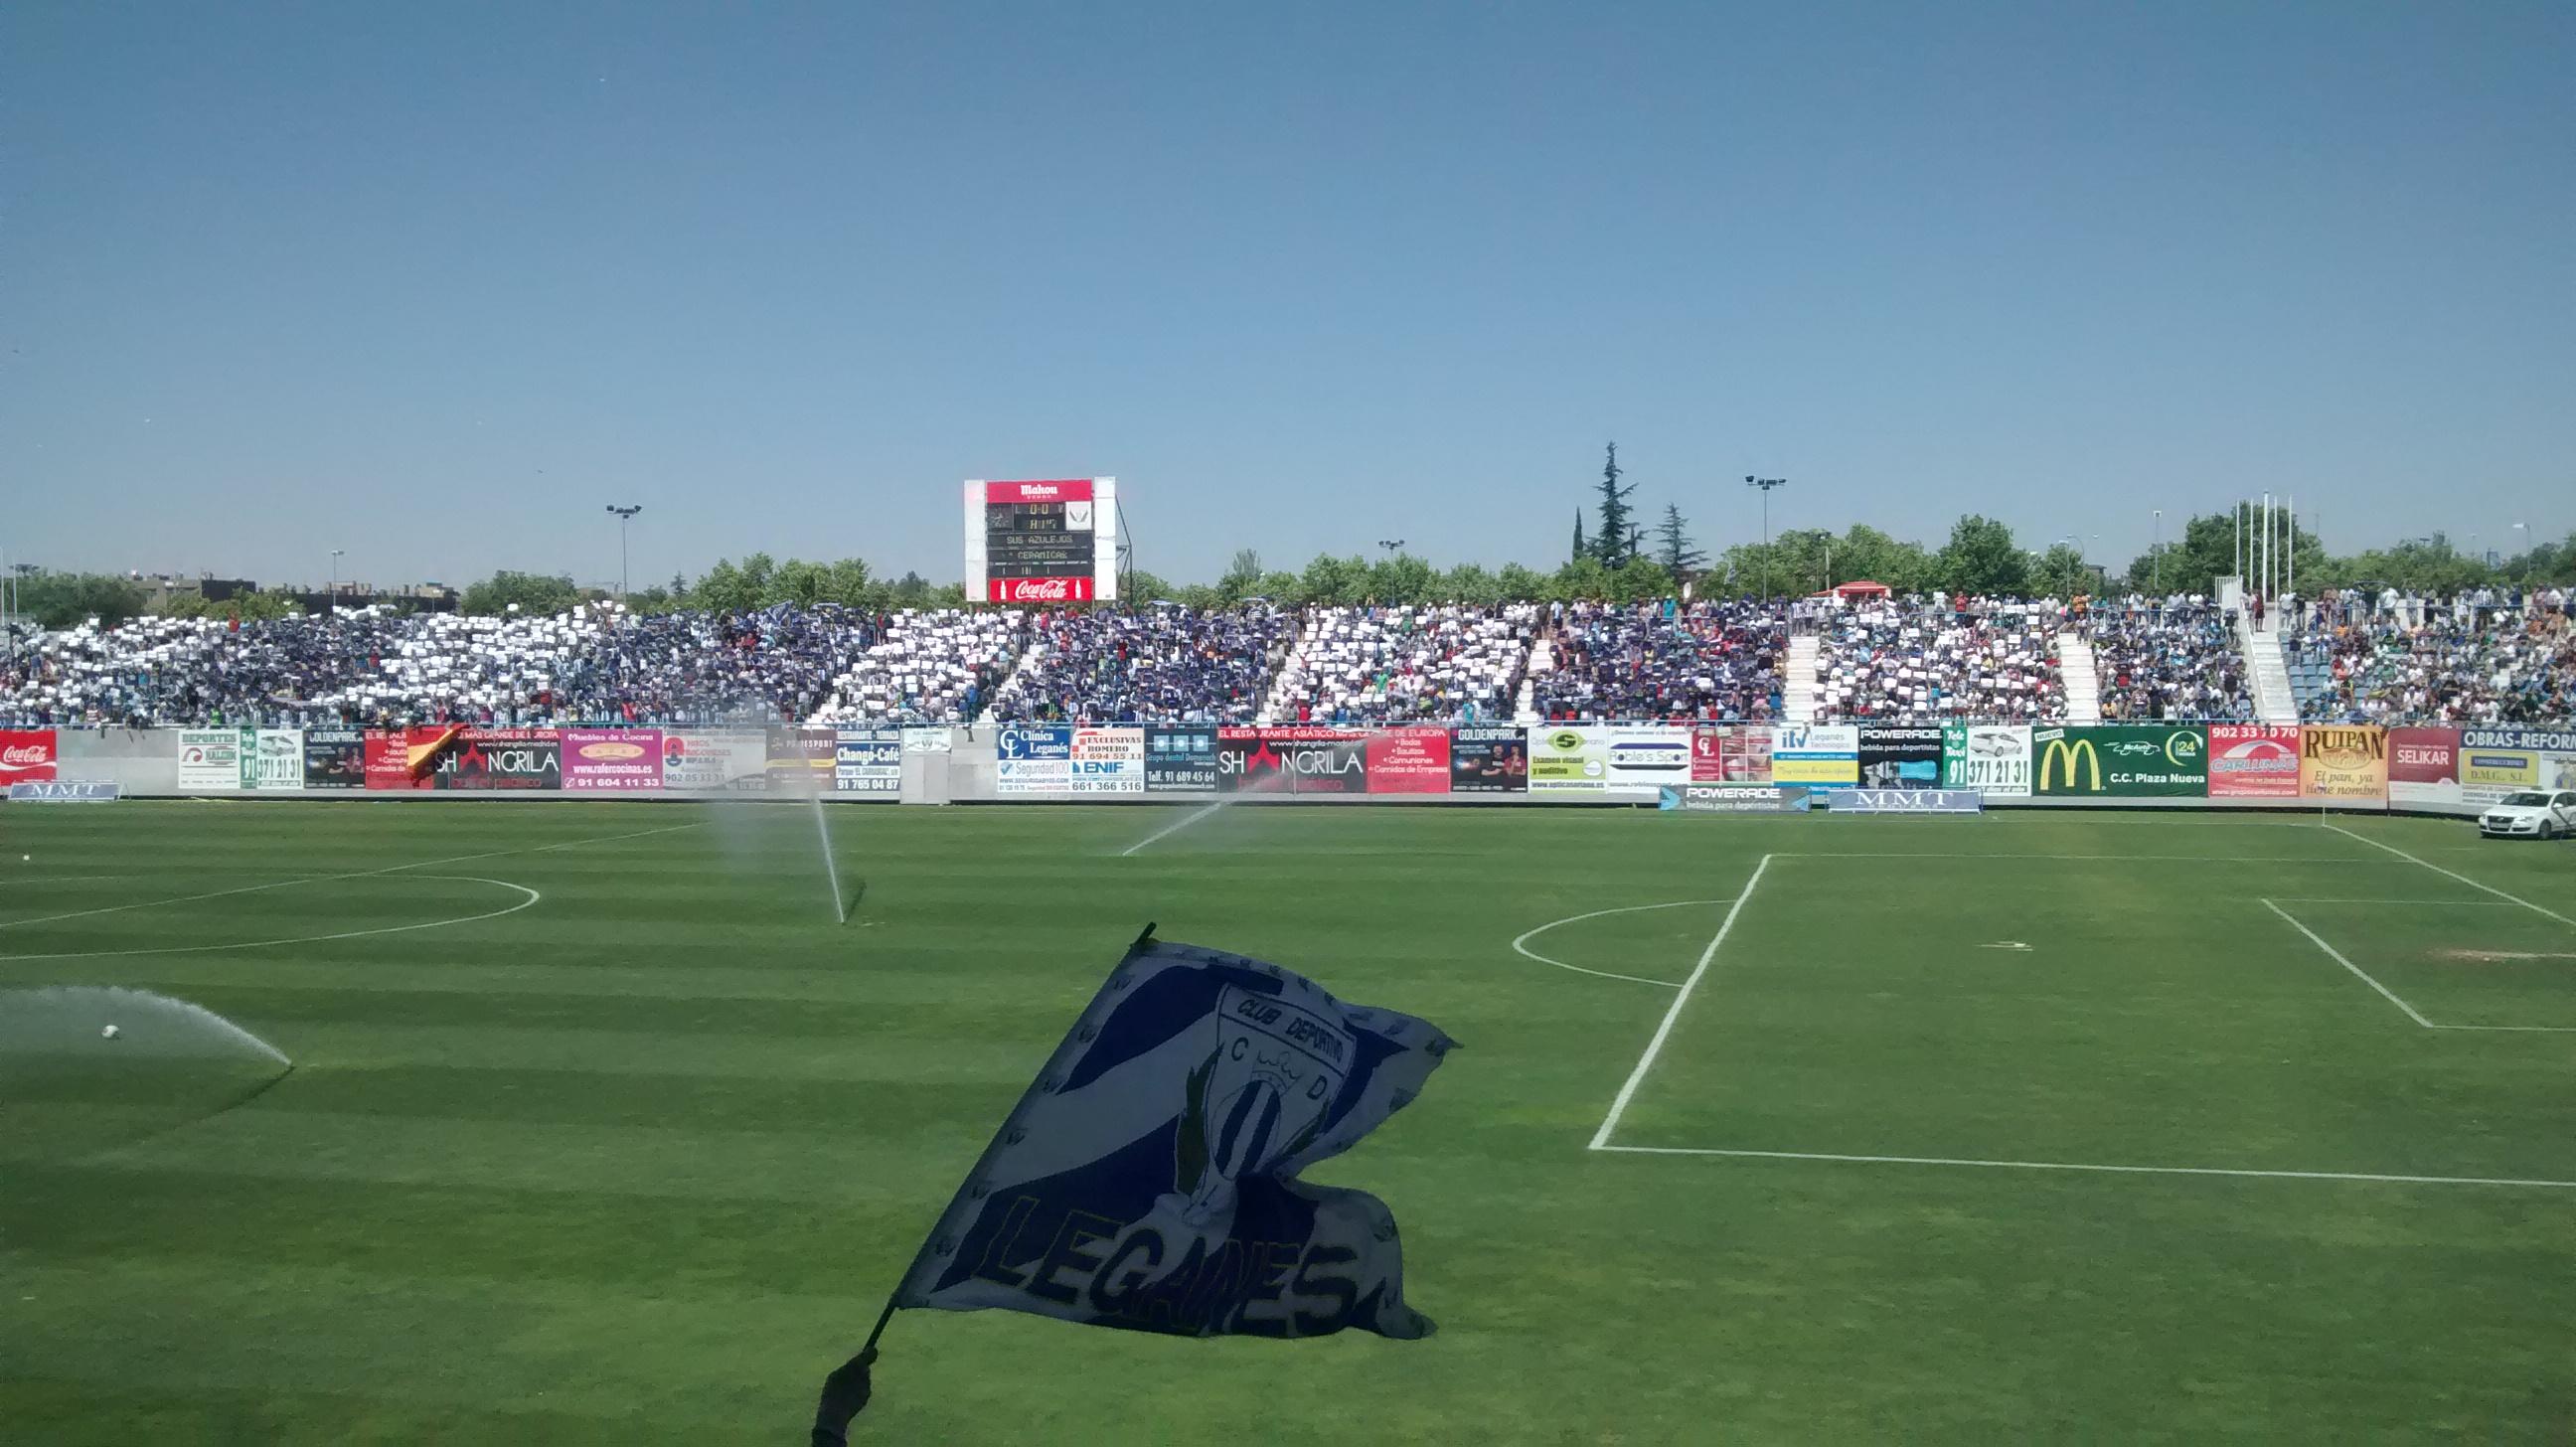 Segunda División B de España 2013-14 - Wikipedia, la enciclopedia libre